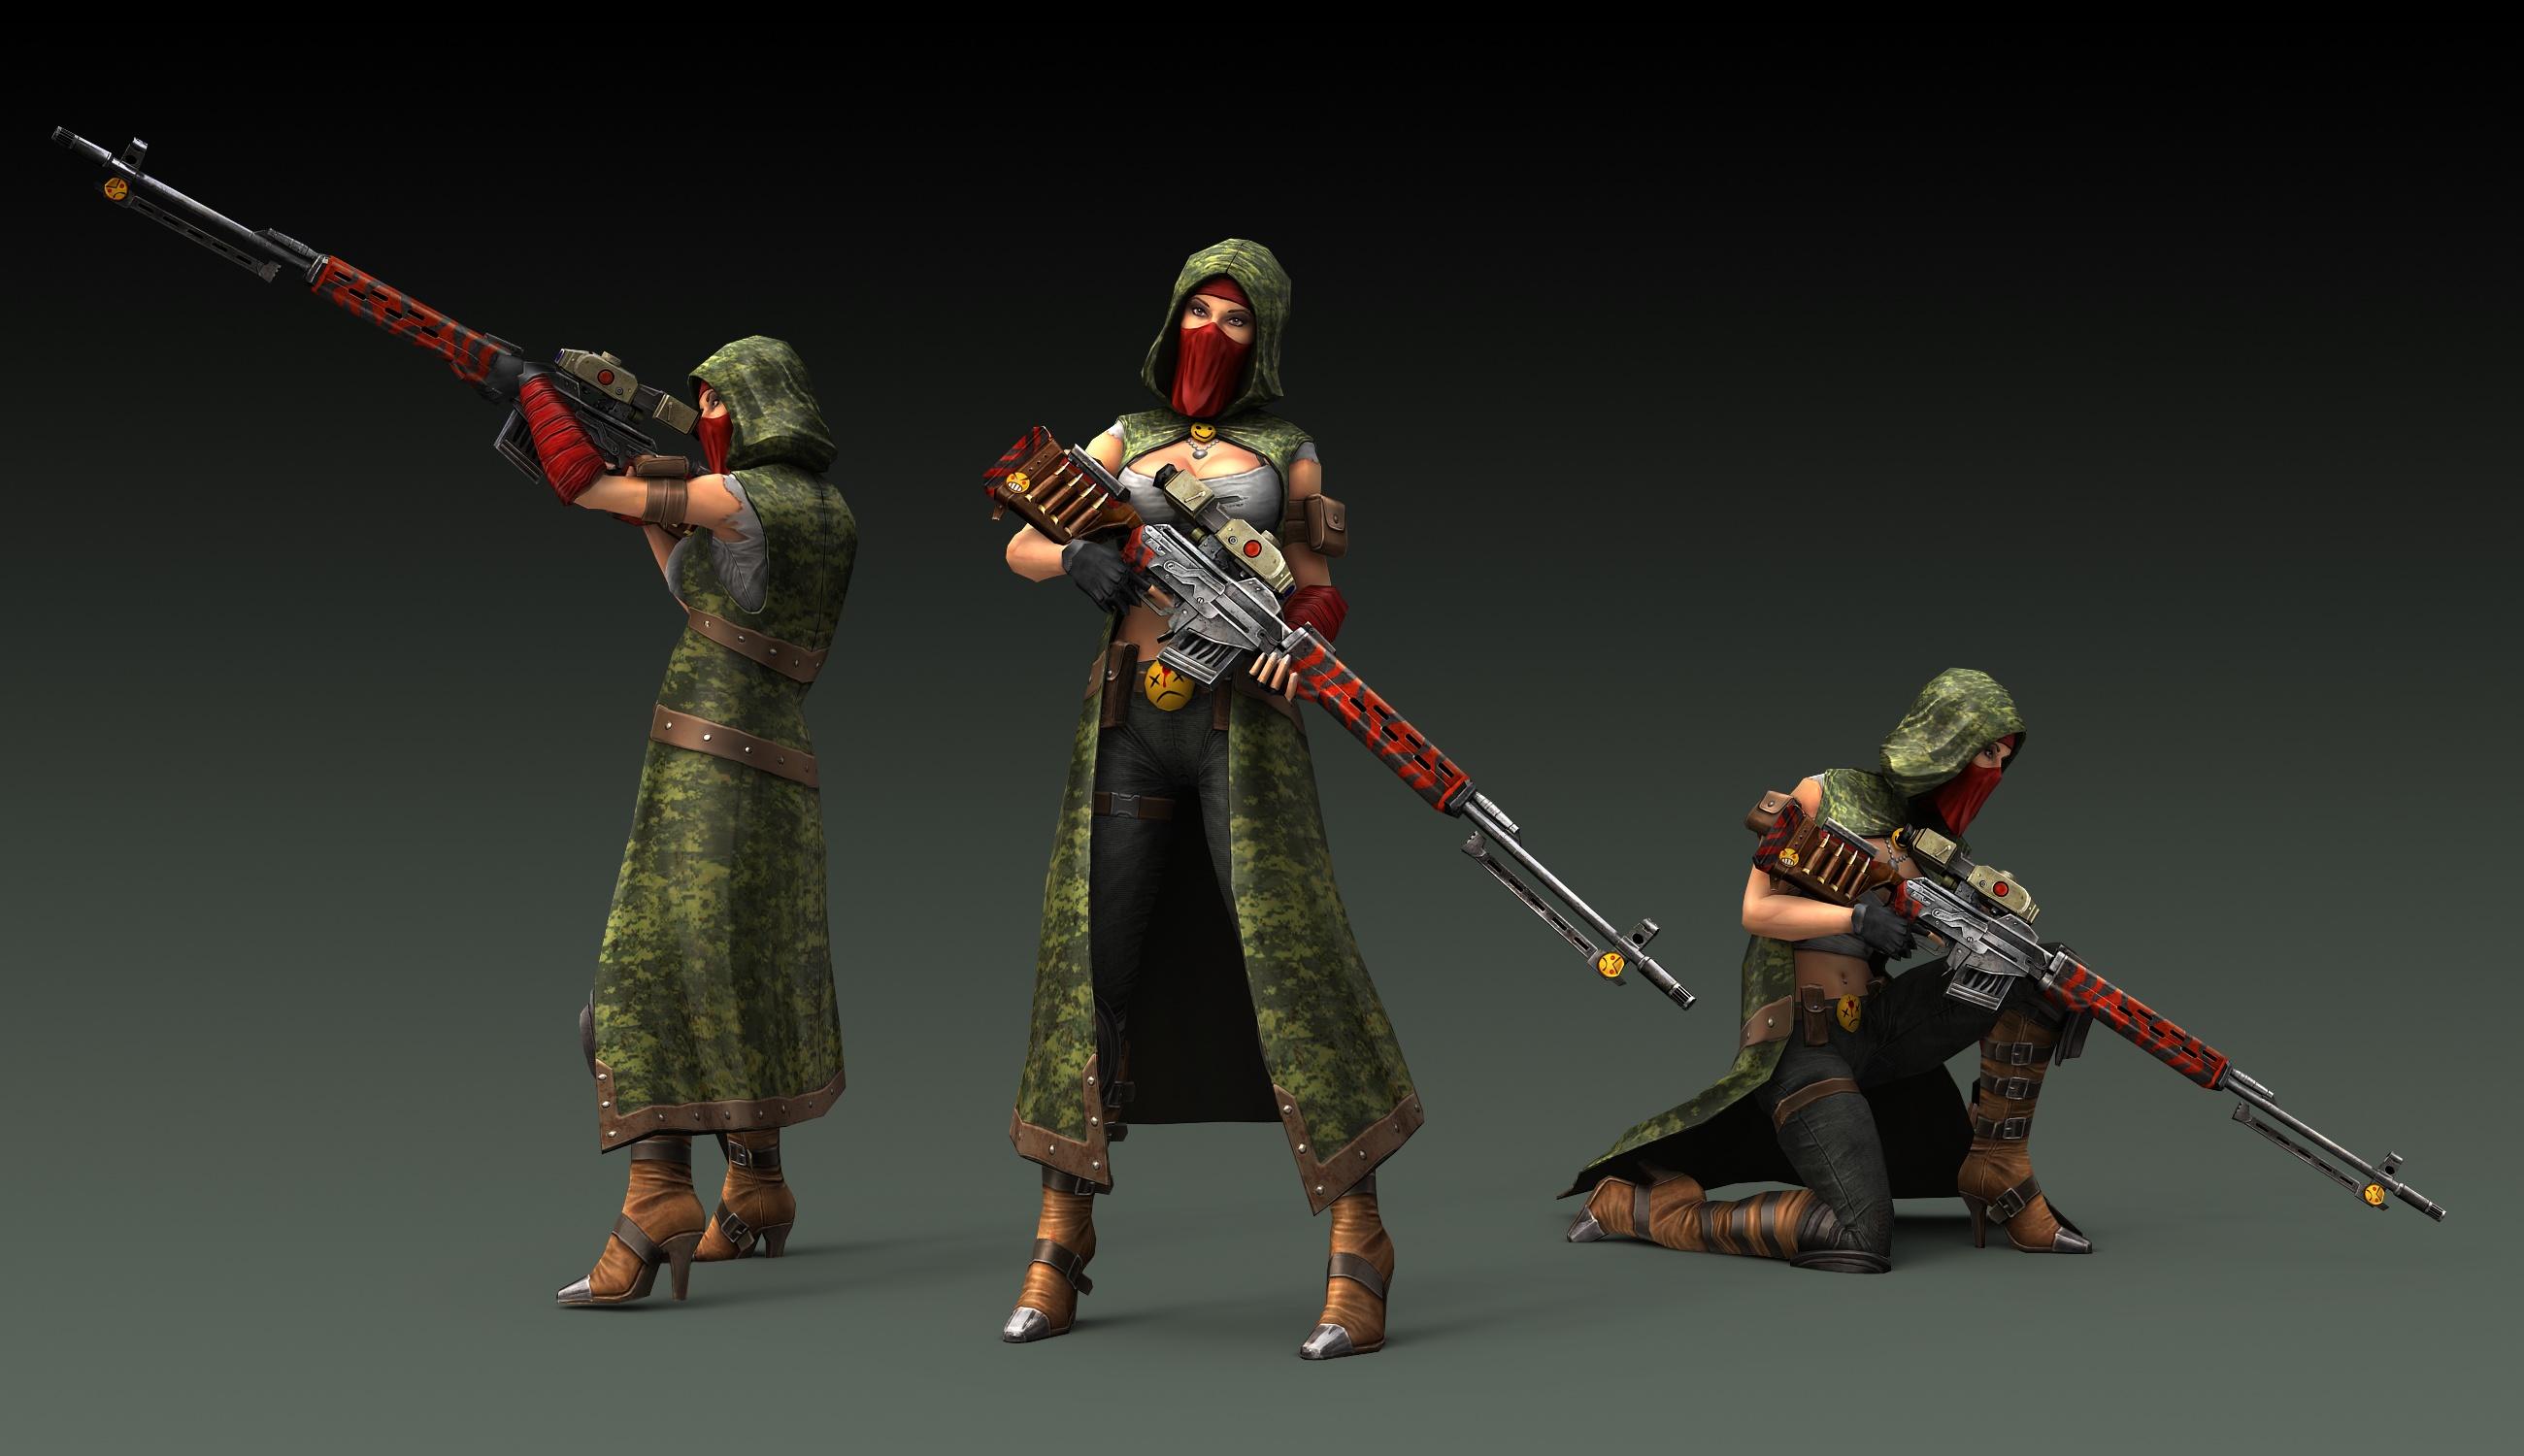 SniperRendering